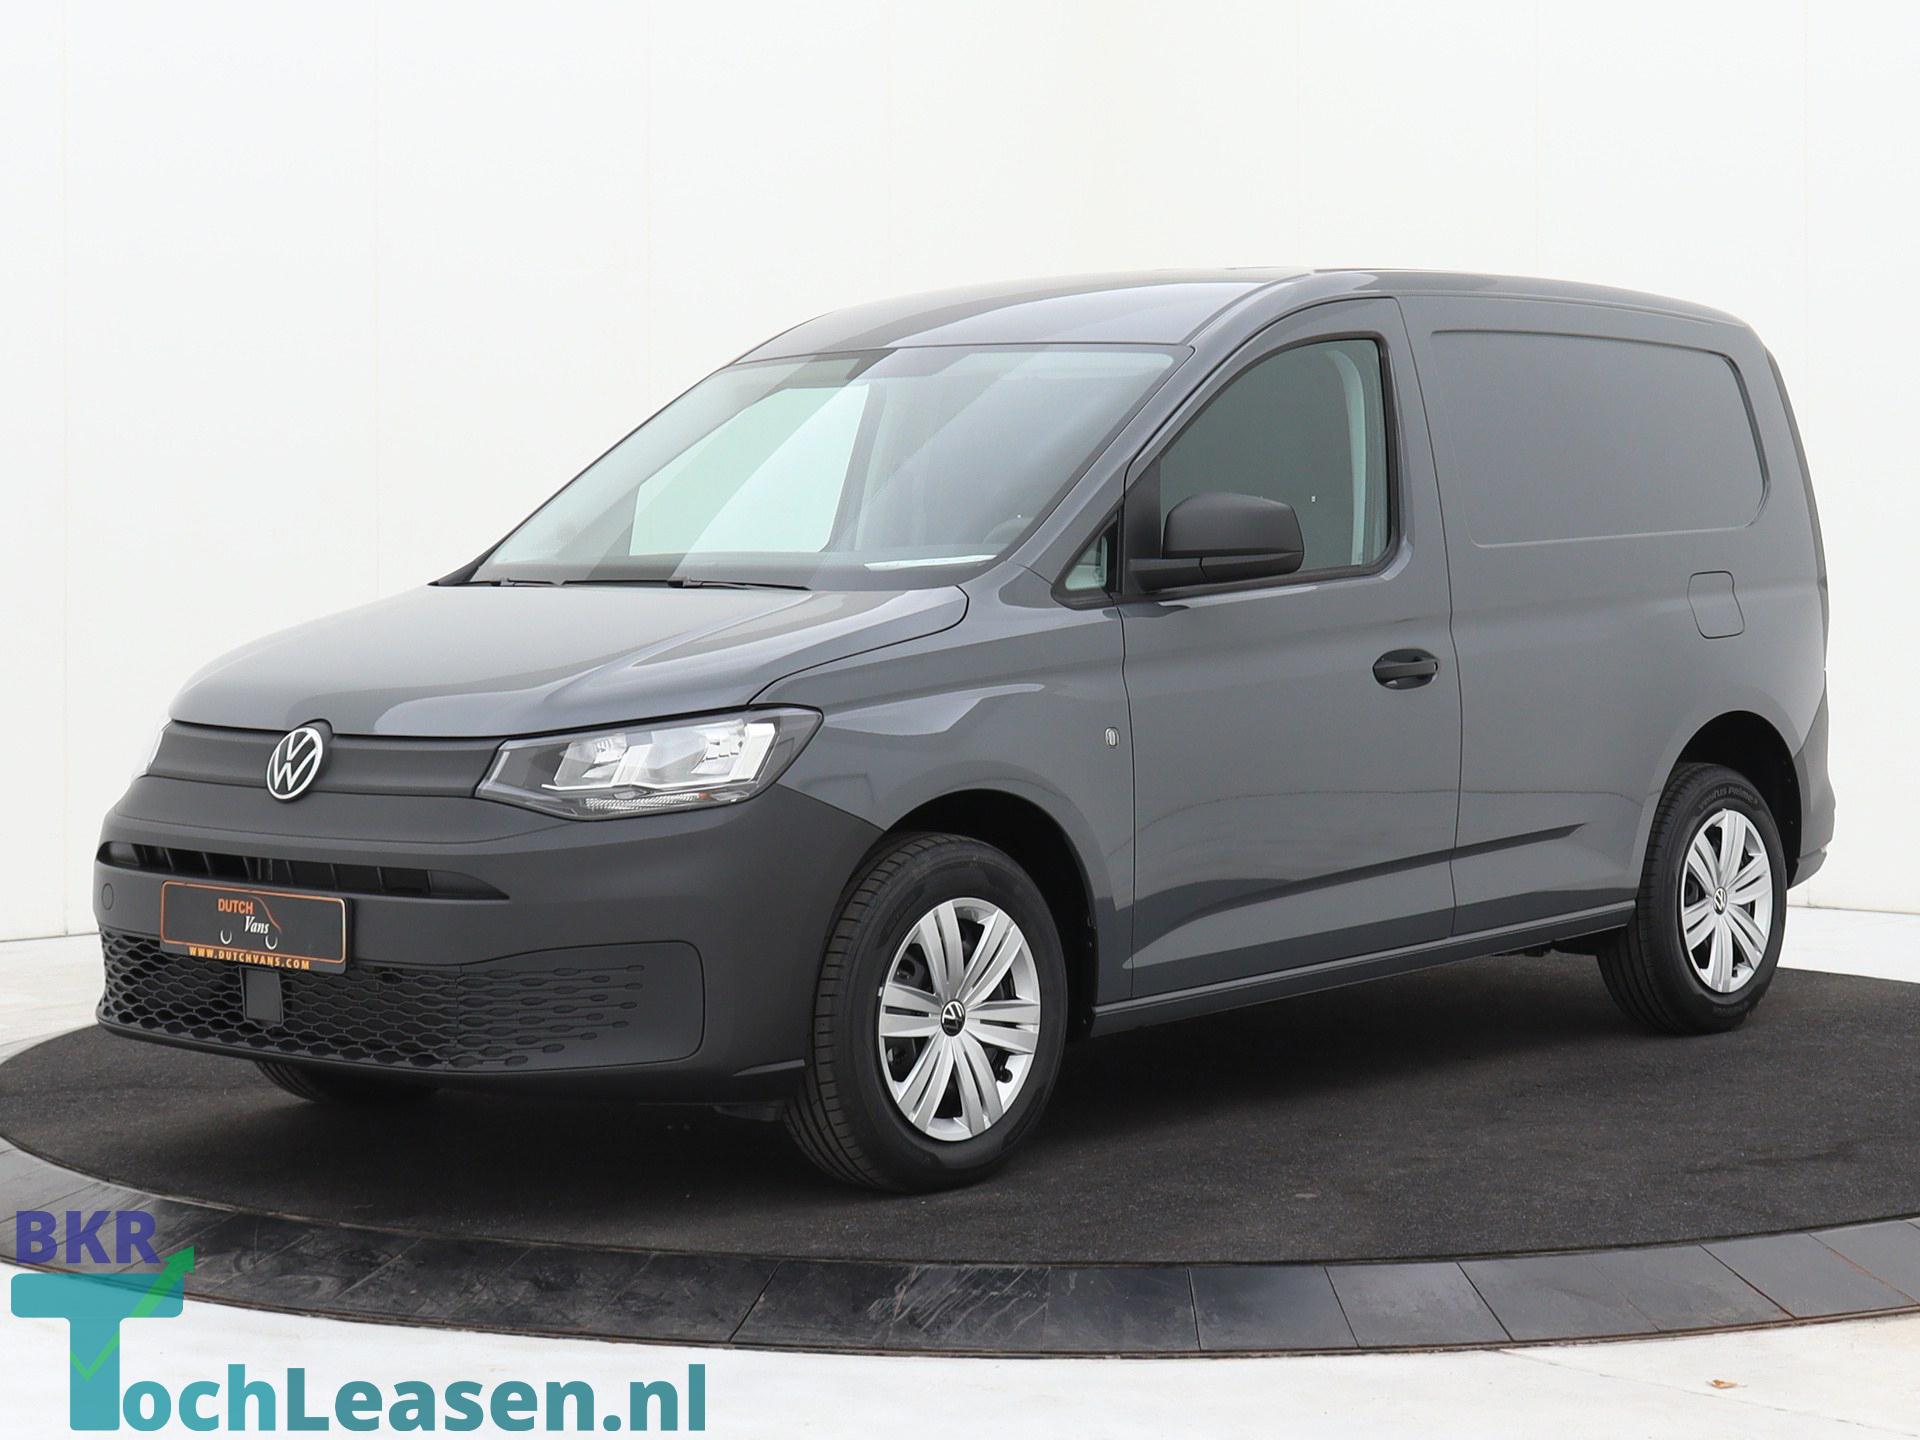 BKR toch leasen - Volkswagen Caddy - Grijs 18